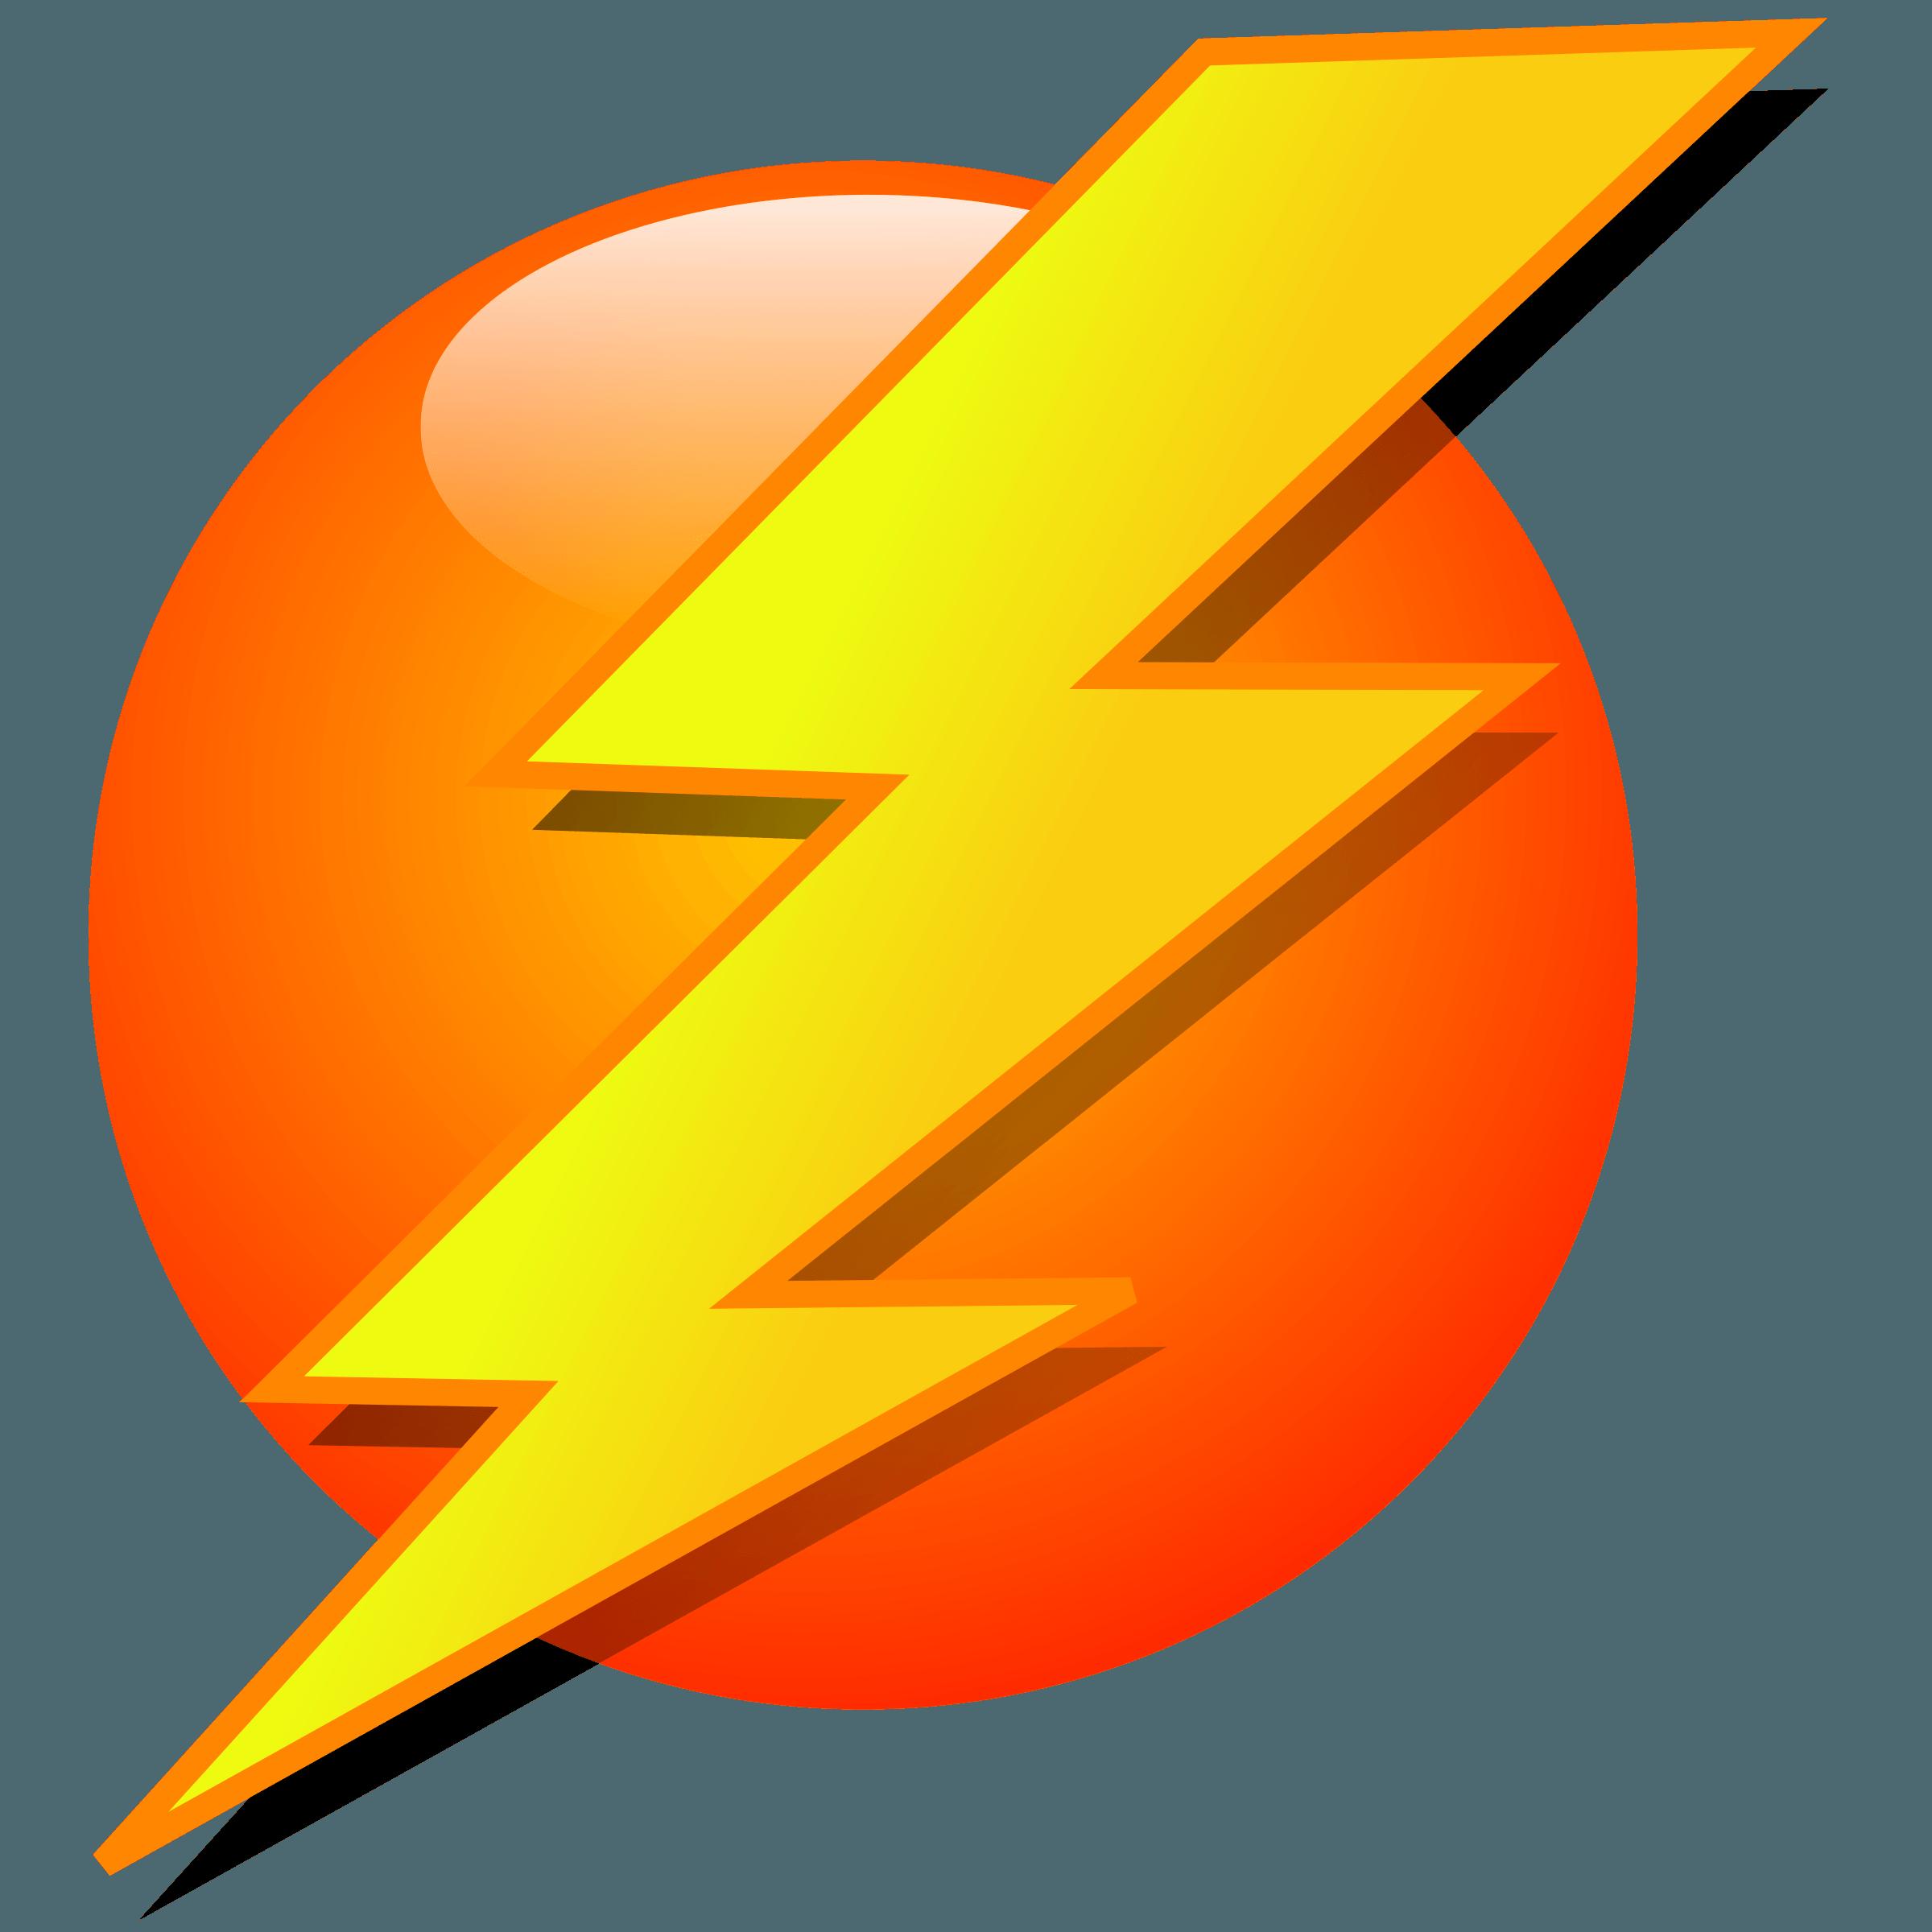 beauty electricity lightning. Electric clipart zap